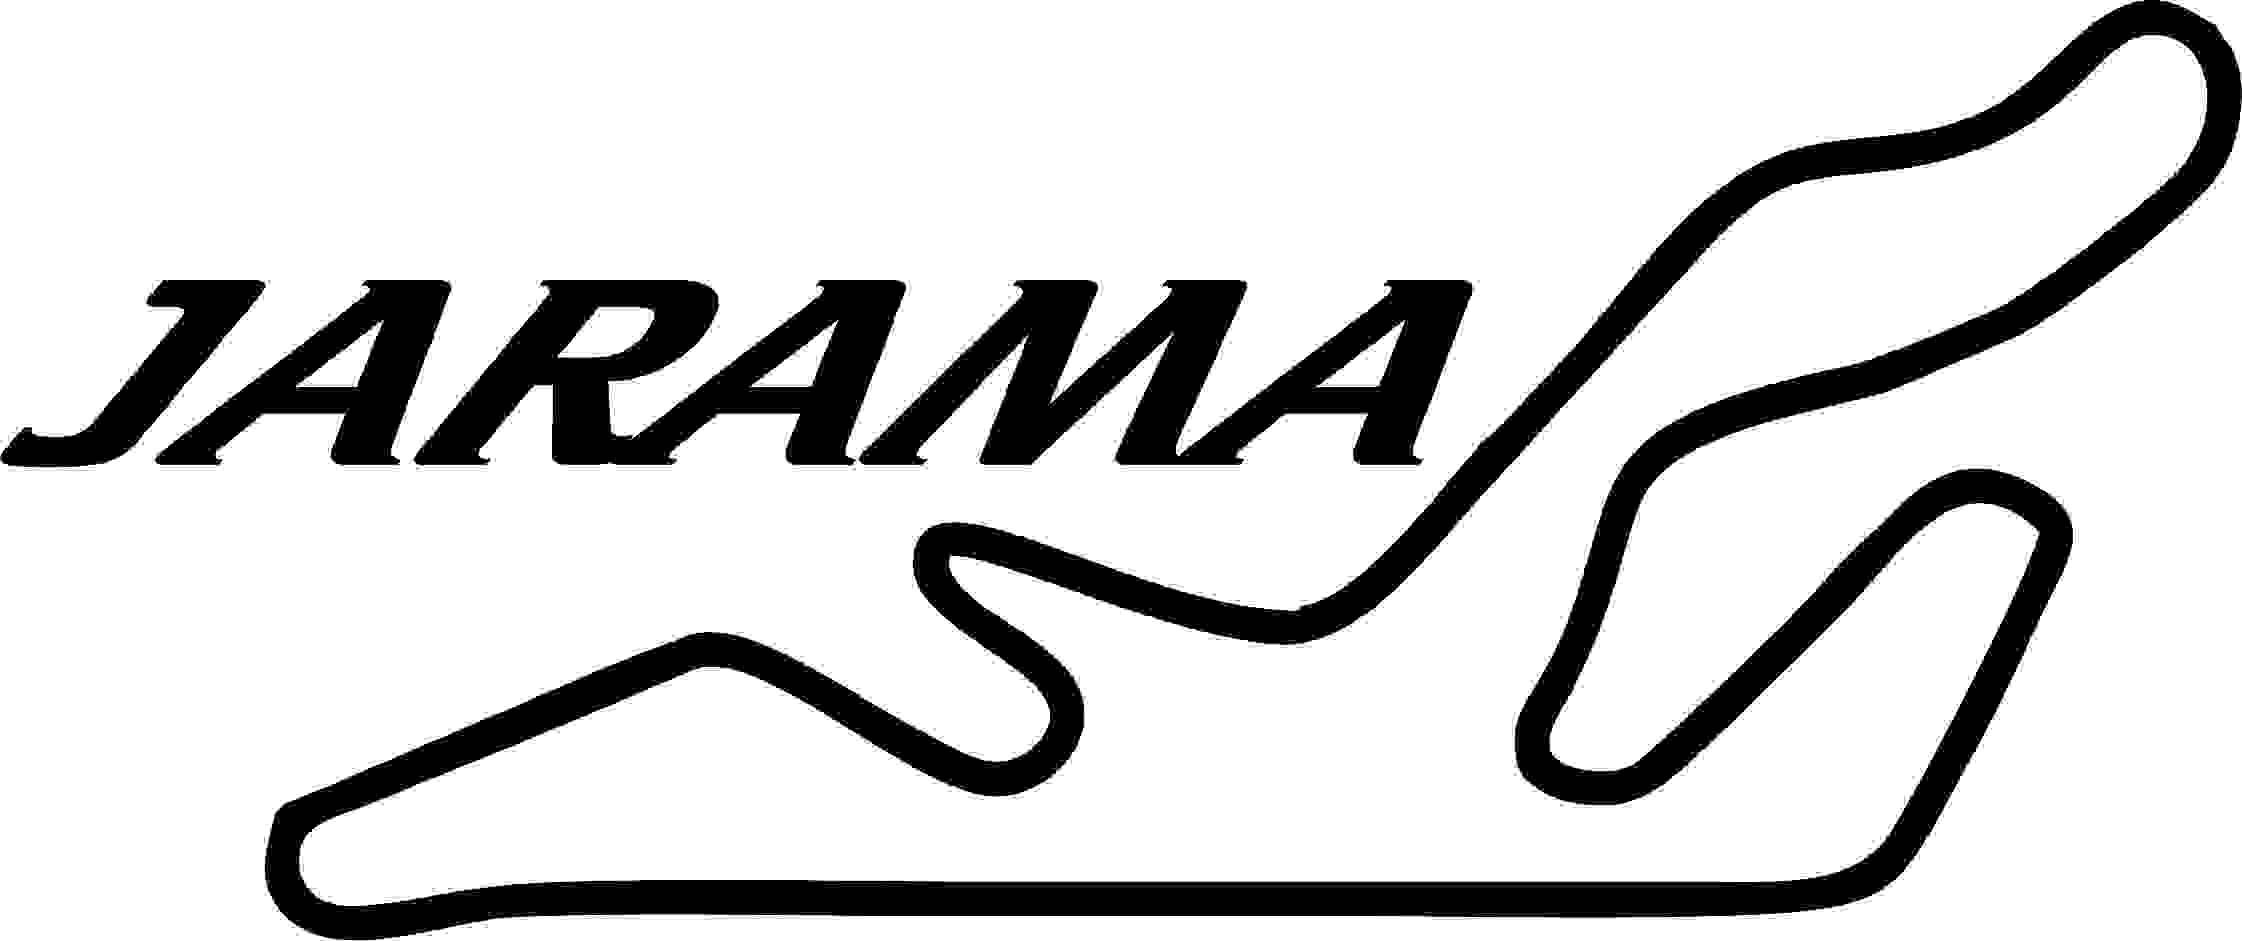 Circuito Jarama : Circuito del jarama